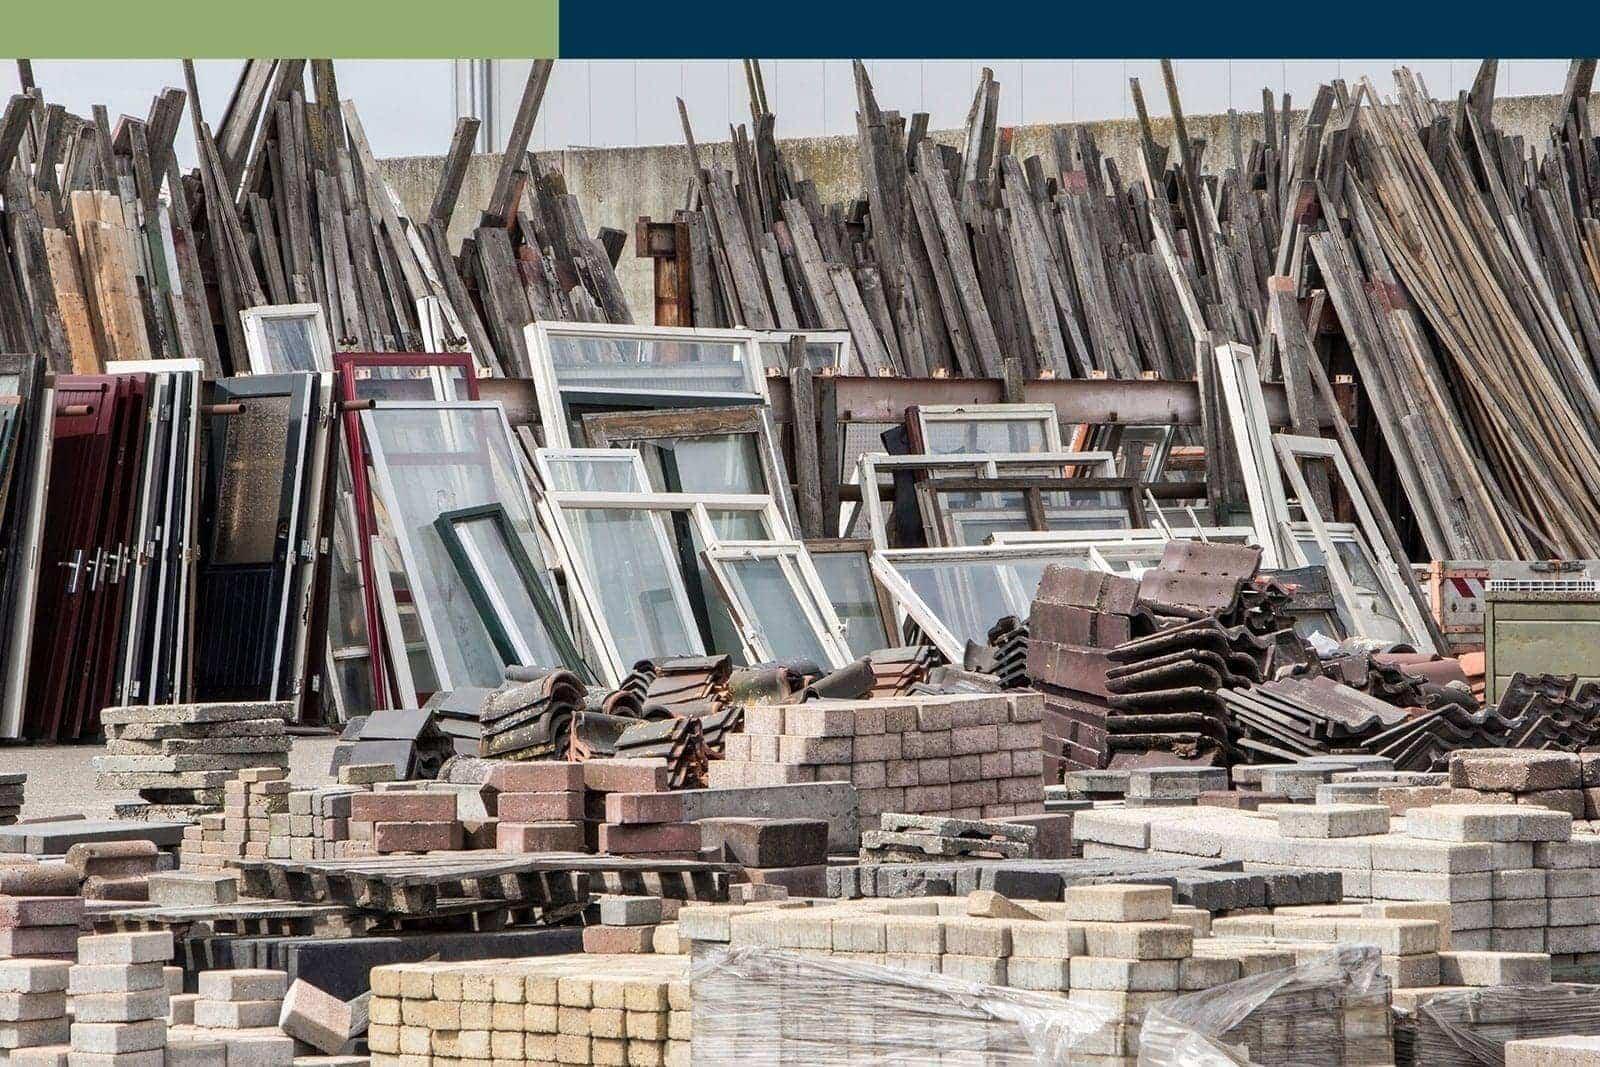 Deconstructing a Home